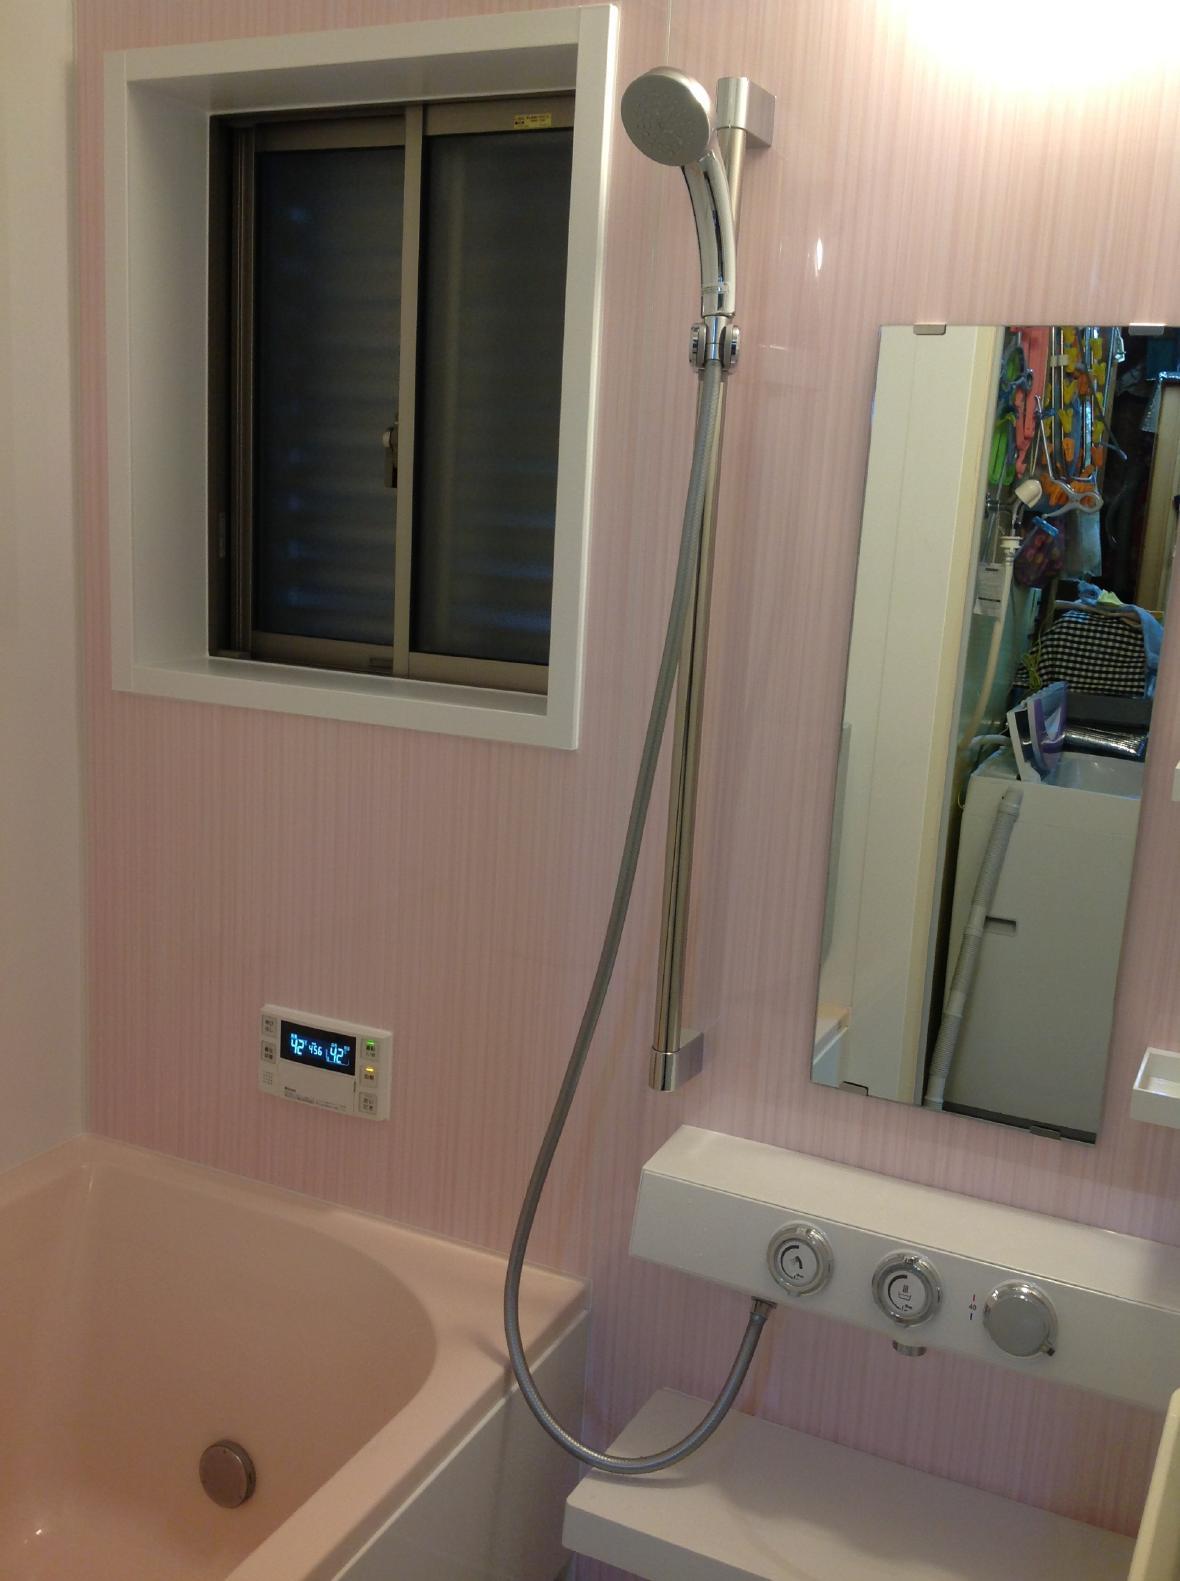 東京都 足立区 風呂リフォーム 給湯器交換 工事後